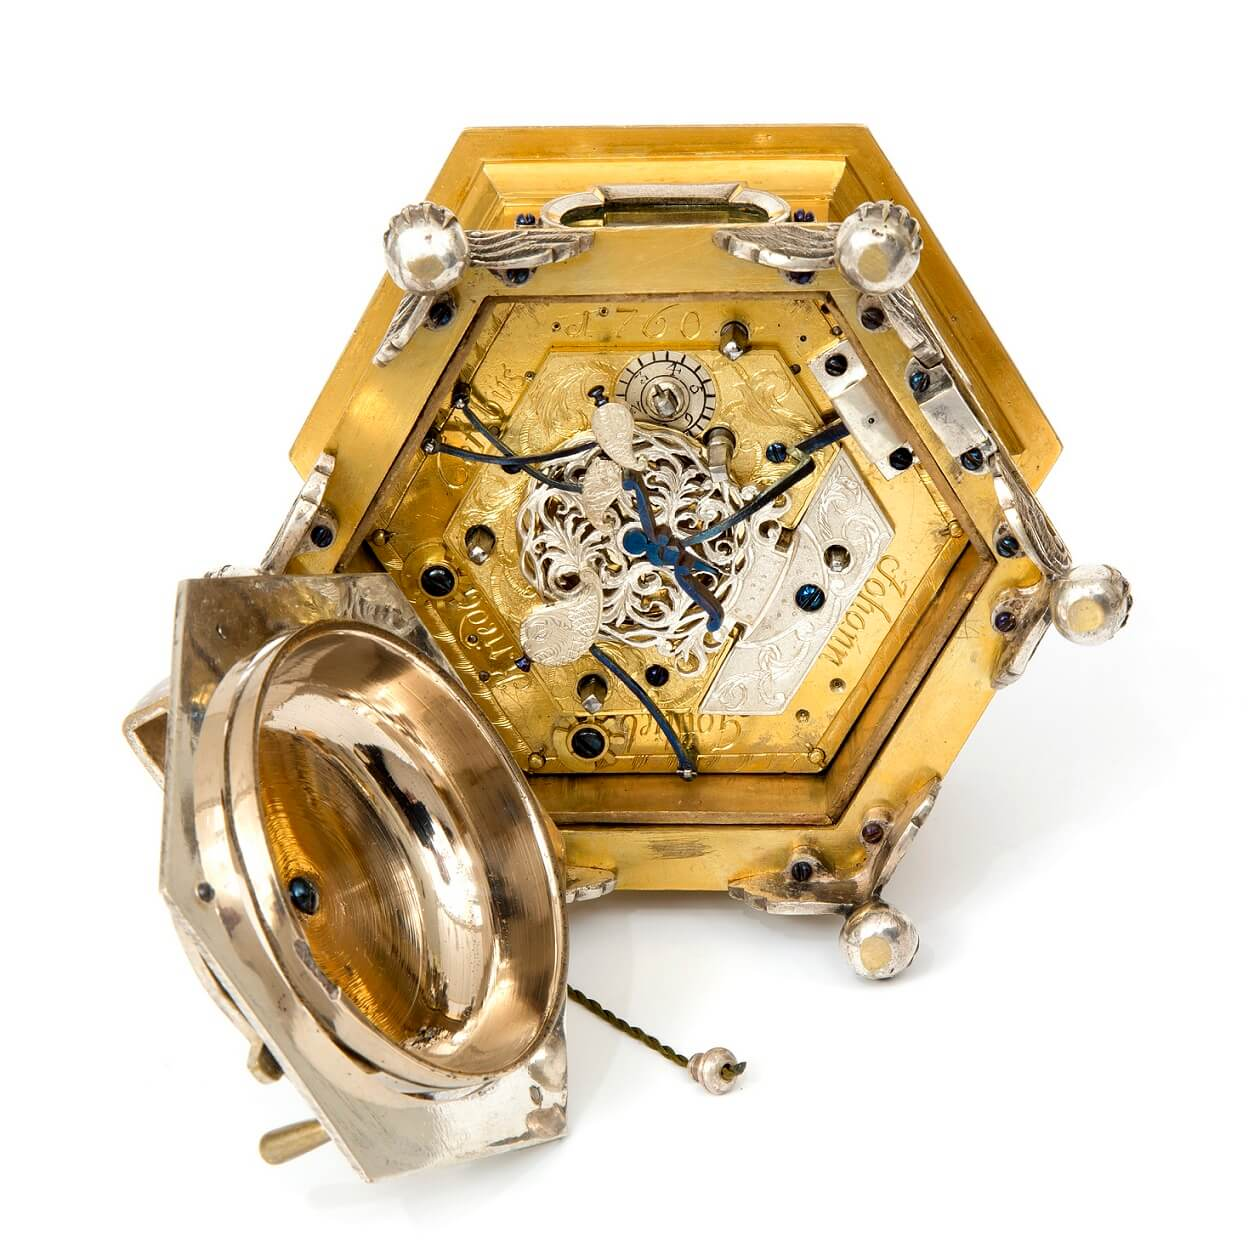 German horizontal hexagonal table clock Kriedel 1760